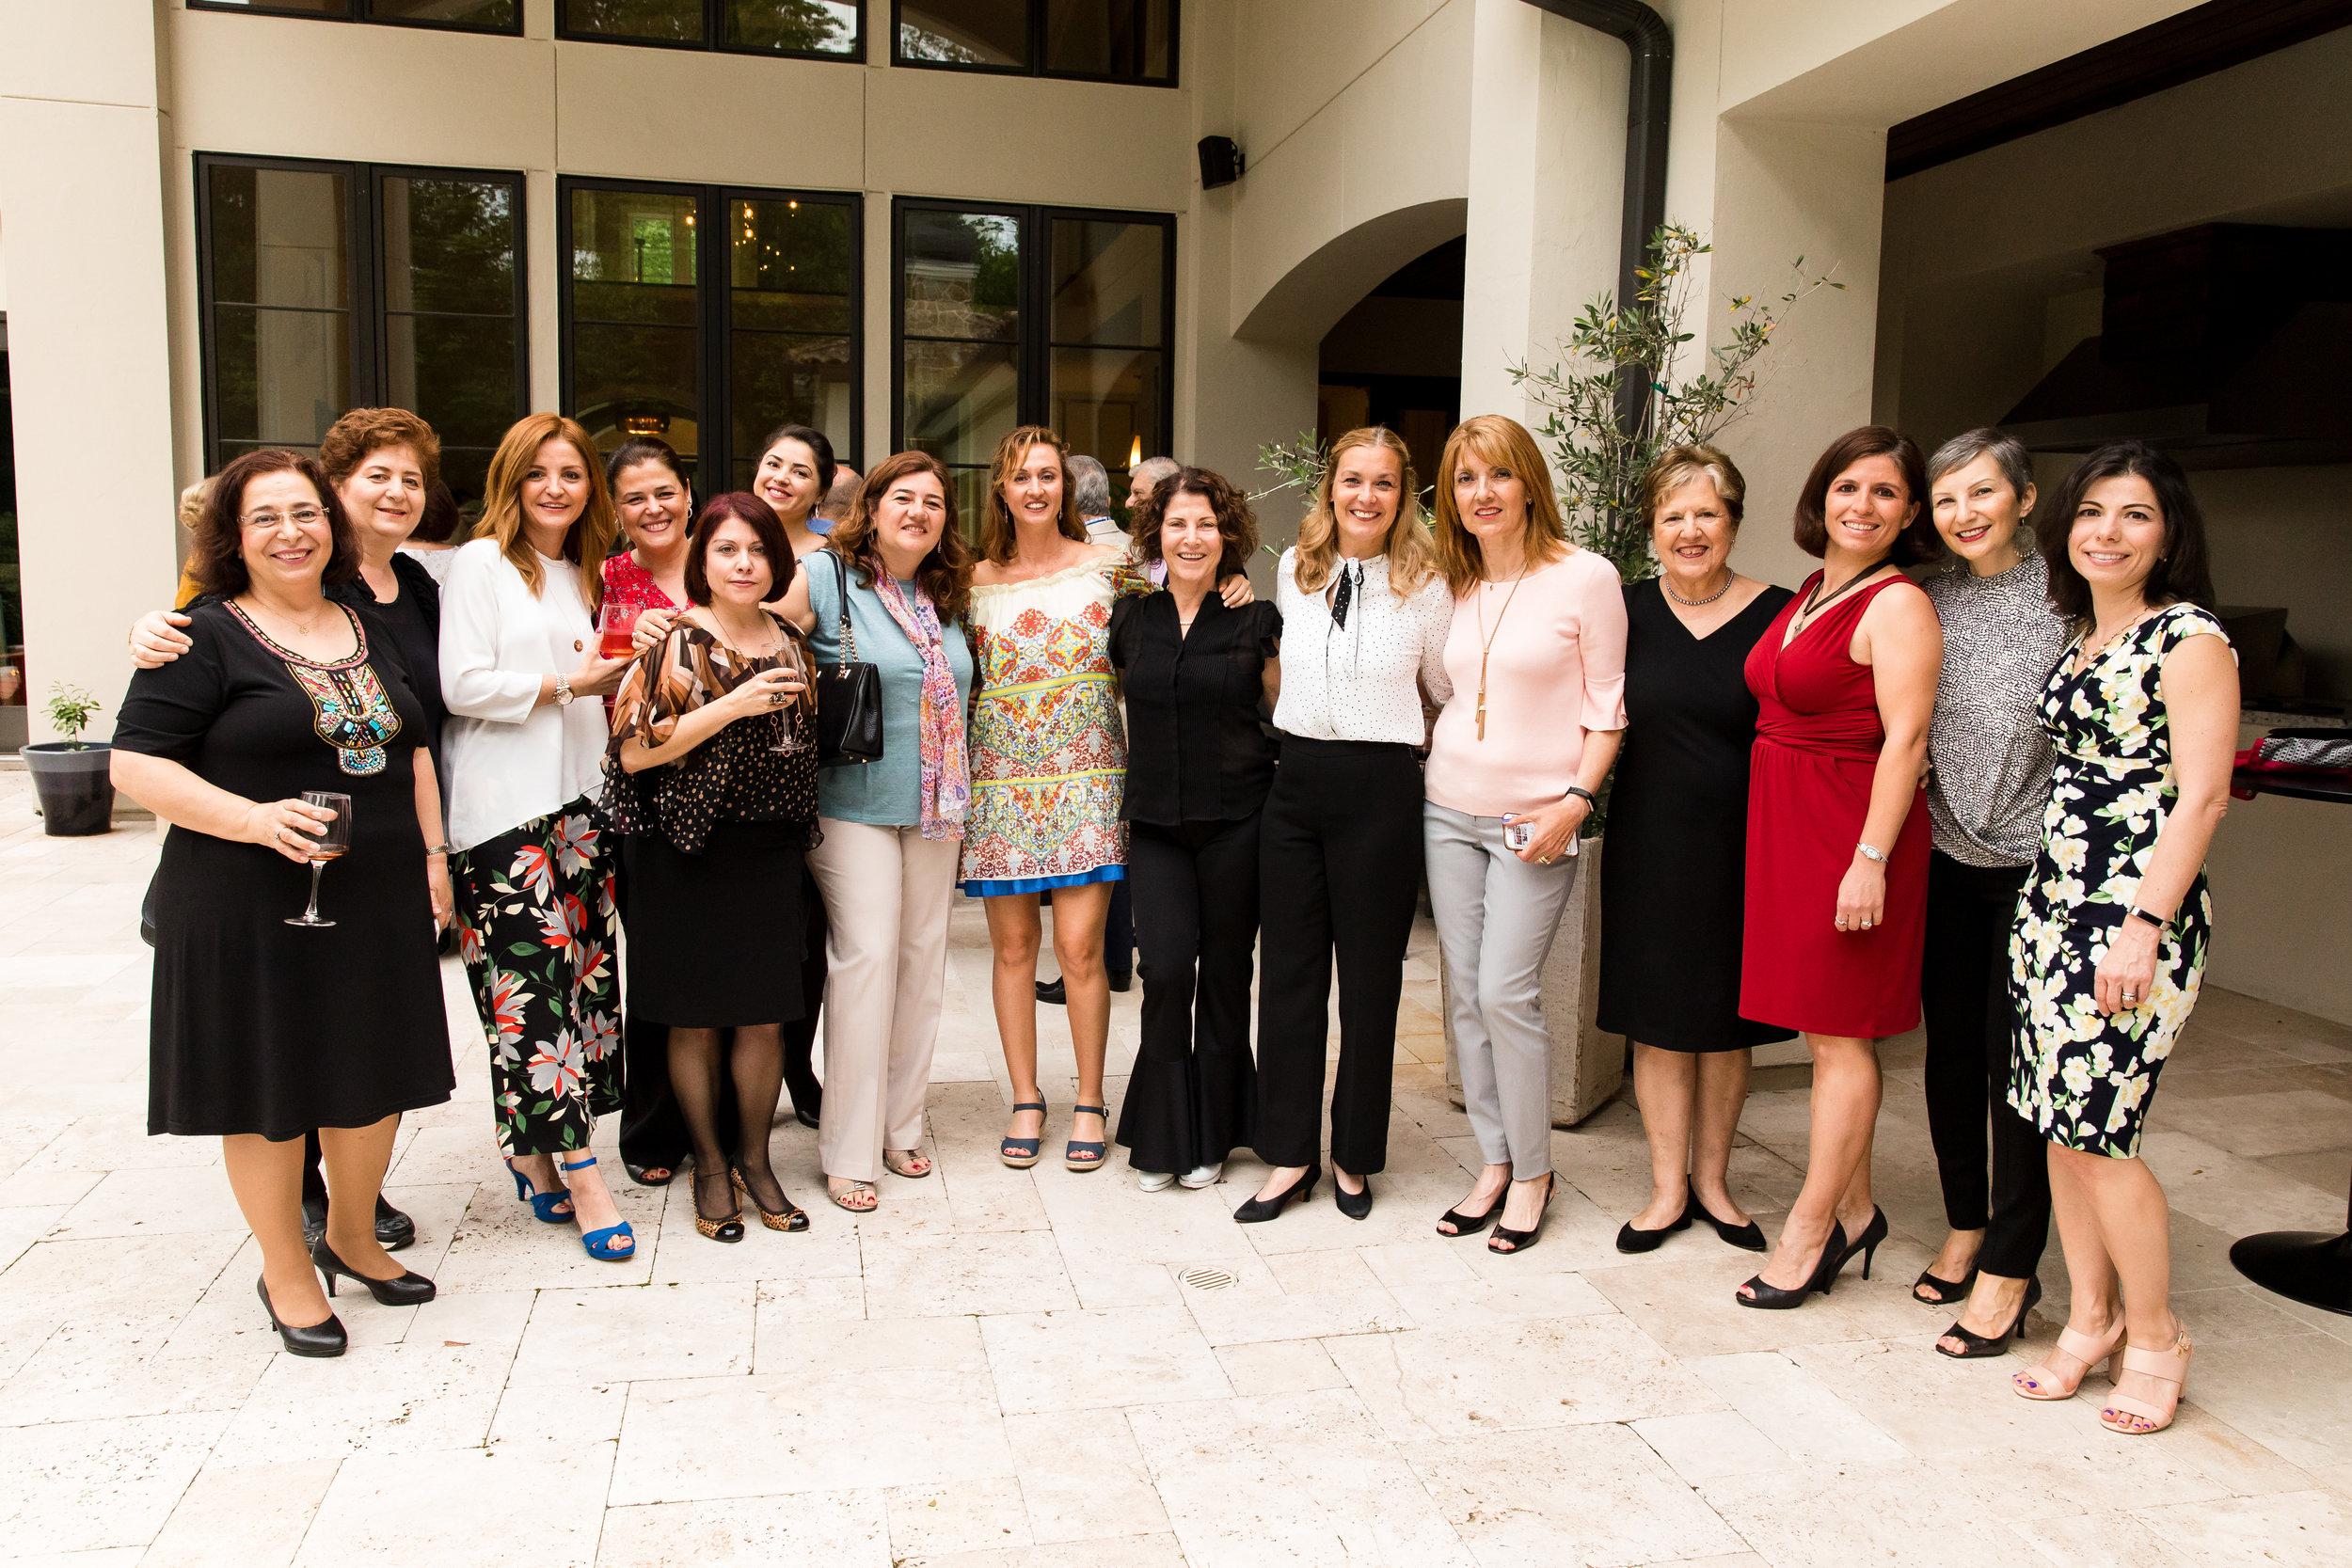 20180421-3rd Annual Education Women Turkey-185.jpg